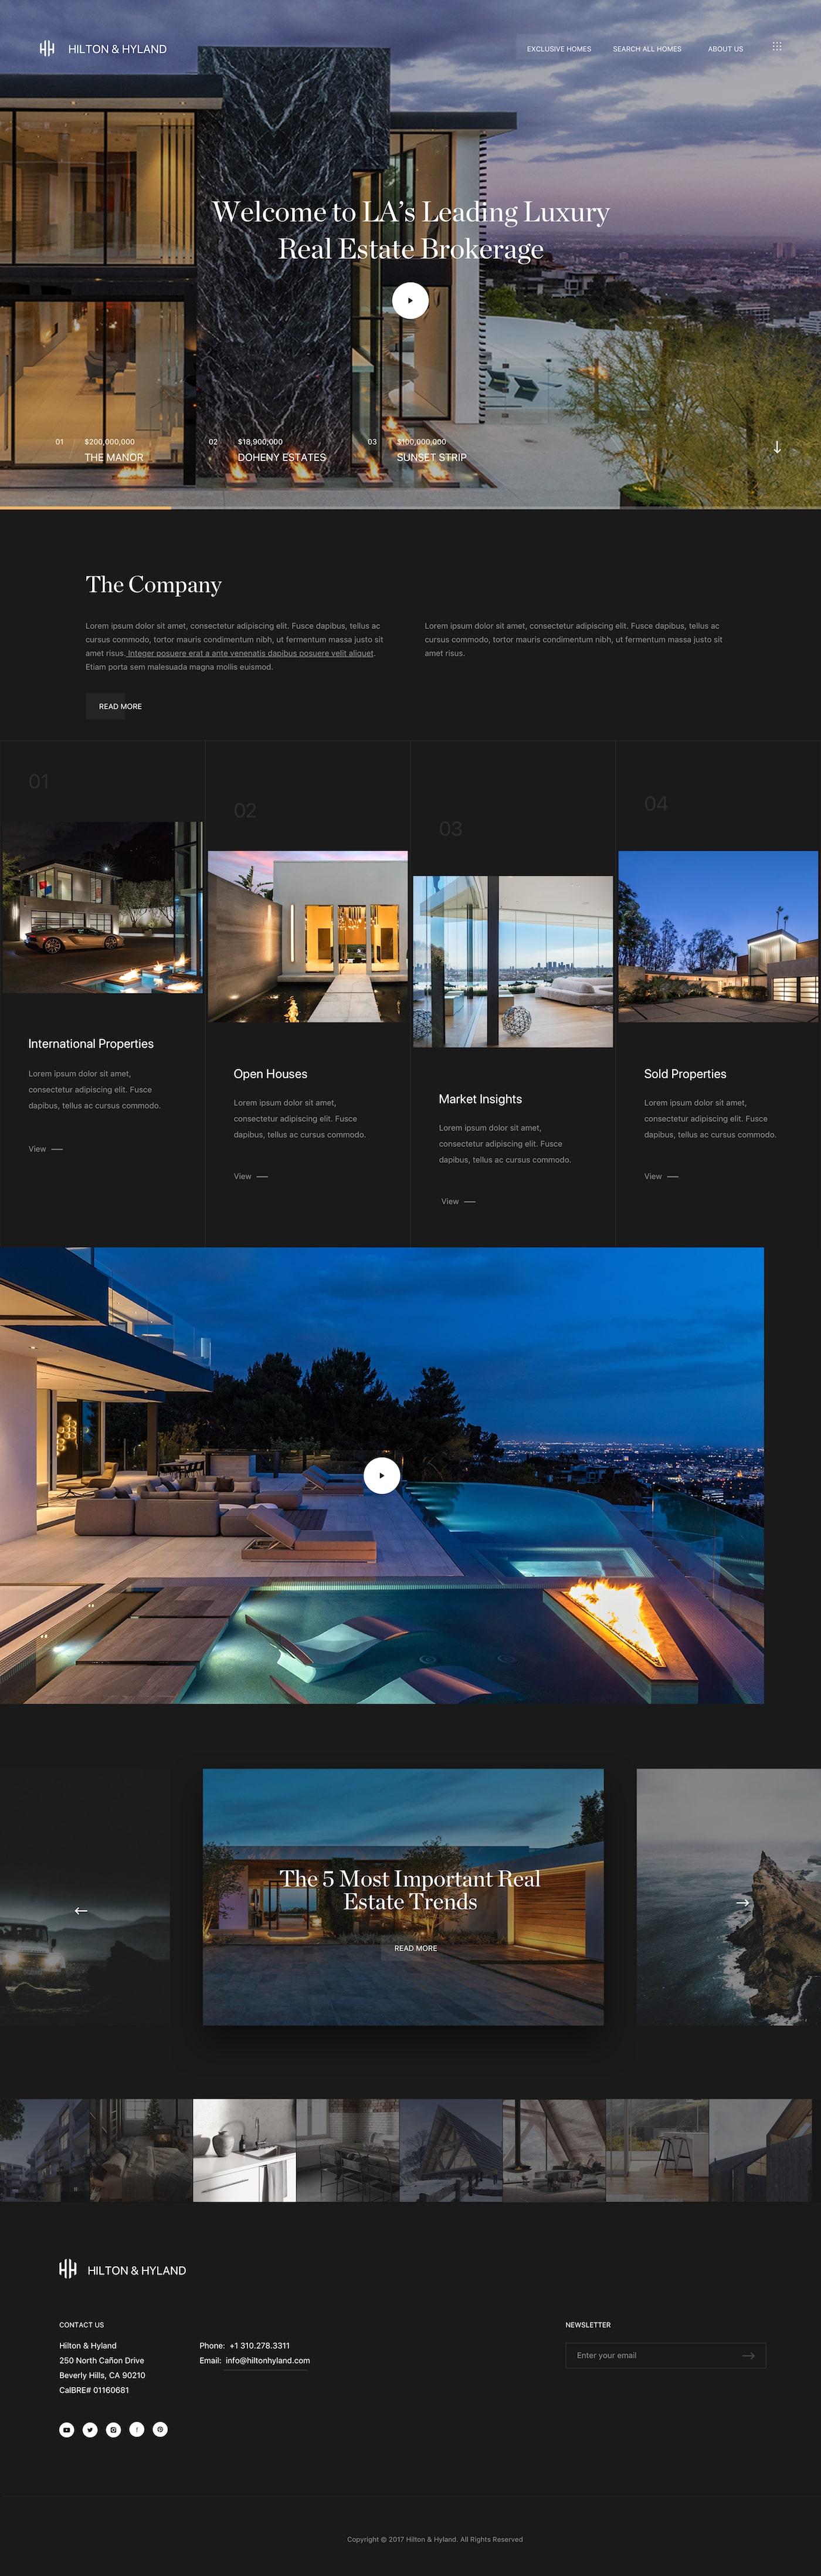 Luxury Presence Award Winning Real Estate Websites Marketing